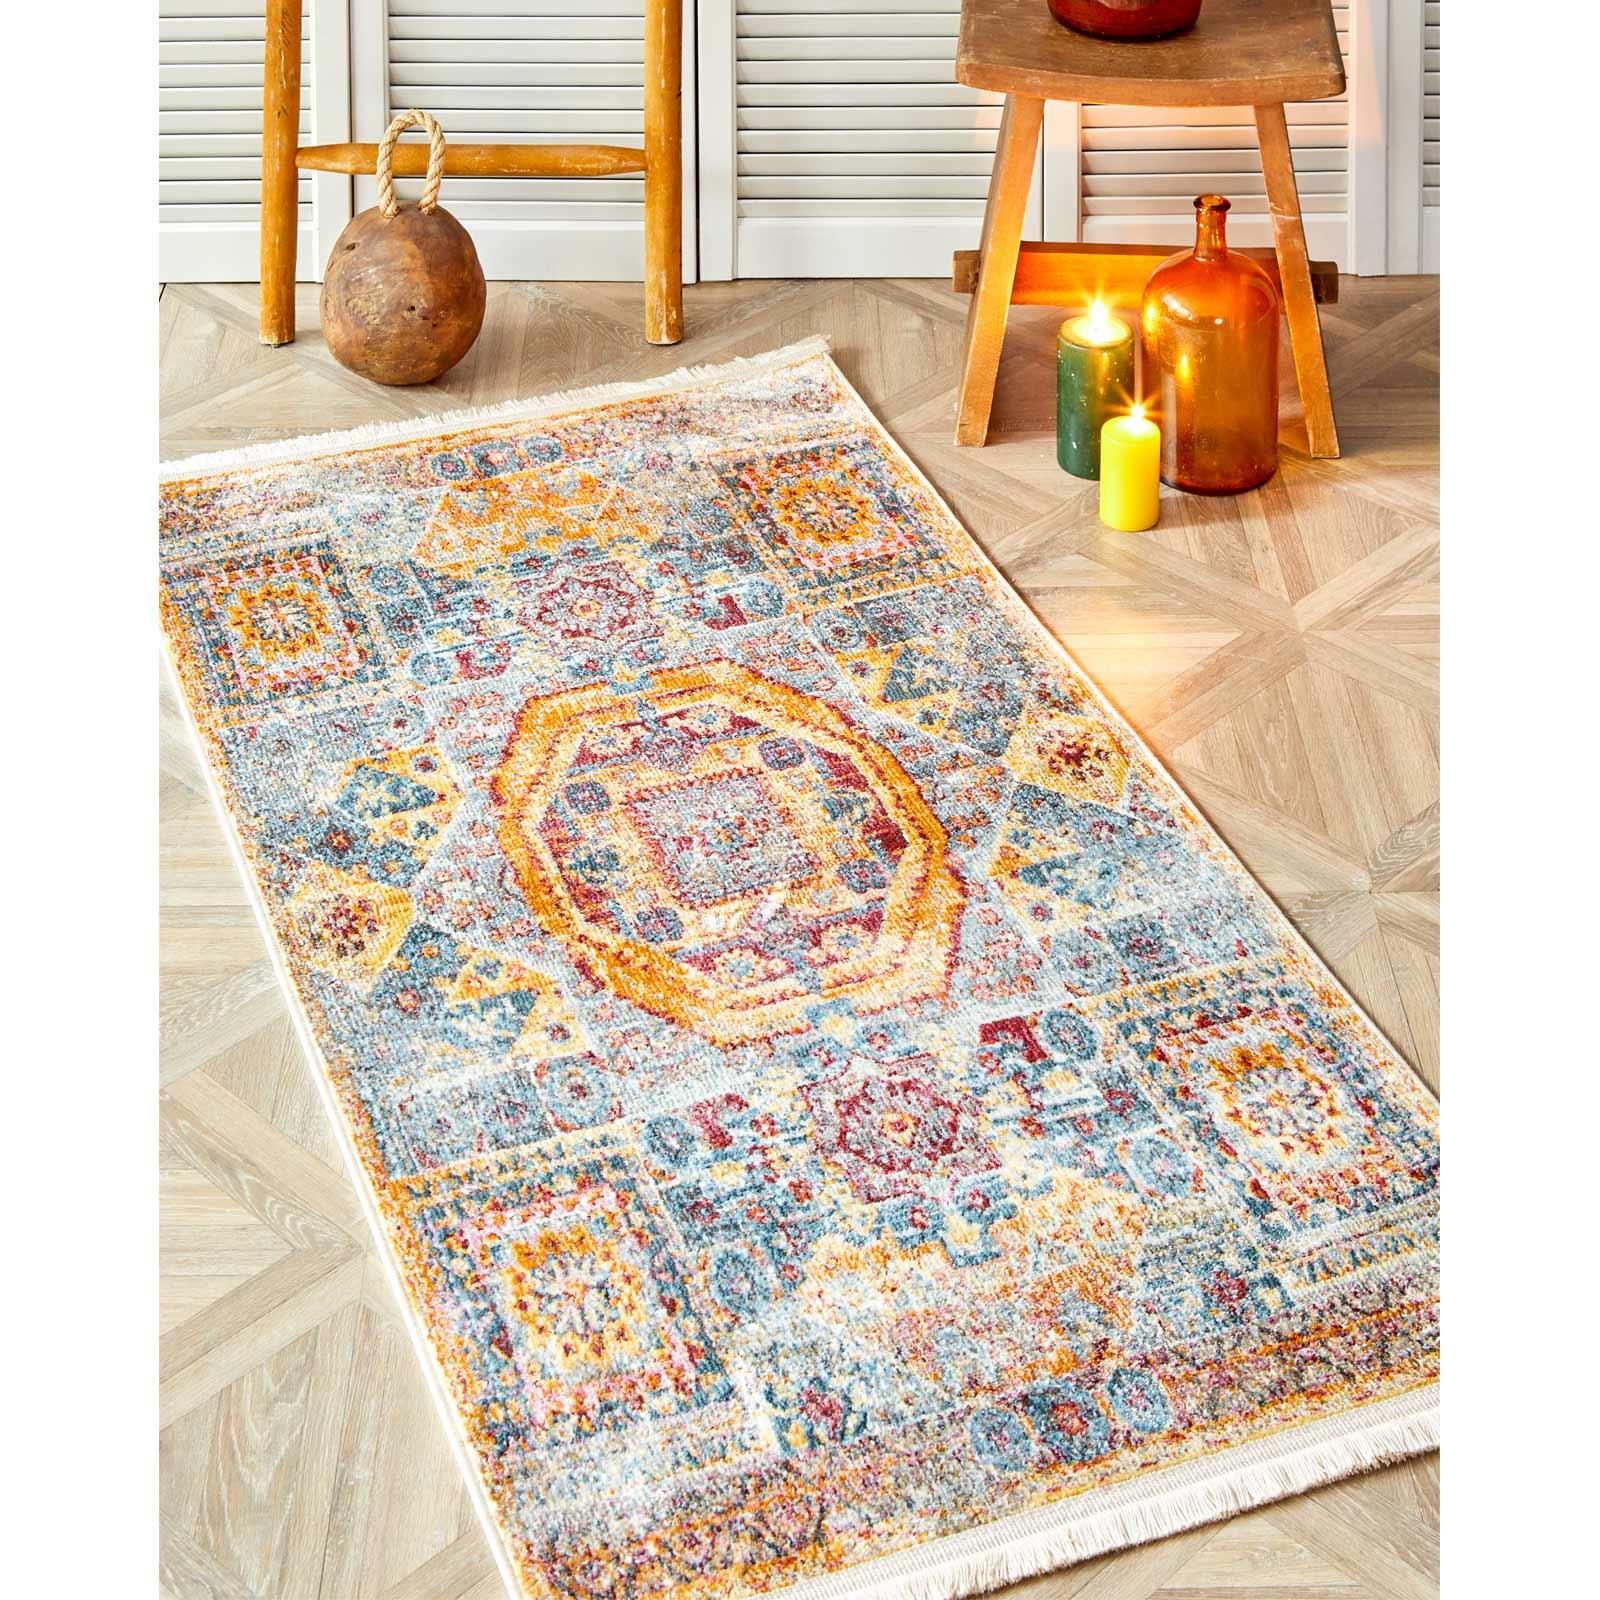 Karaca Home Gordion Turkuaz 80 cm x 150 cm Halı